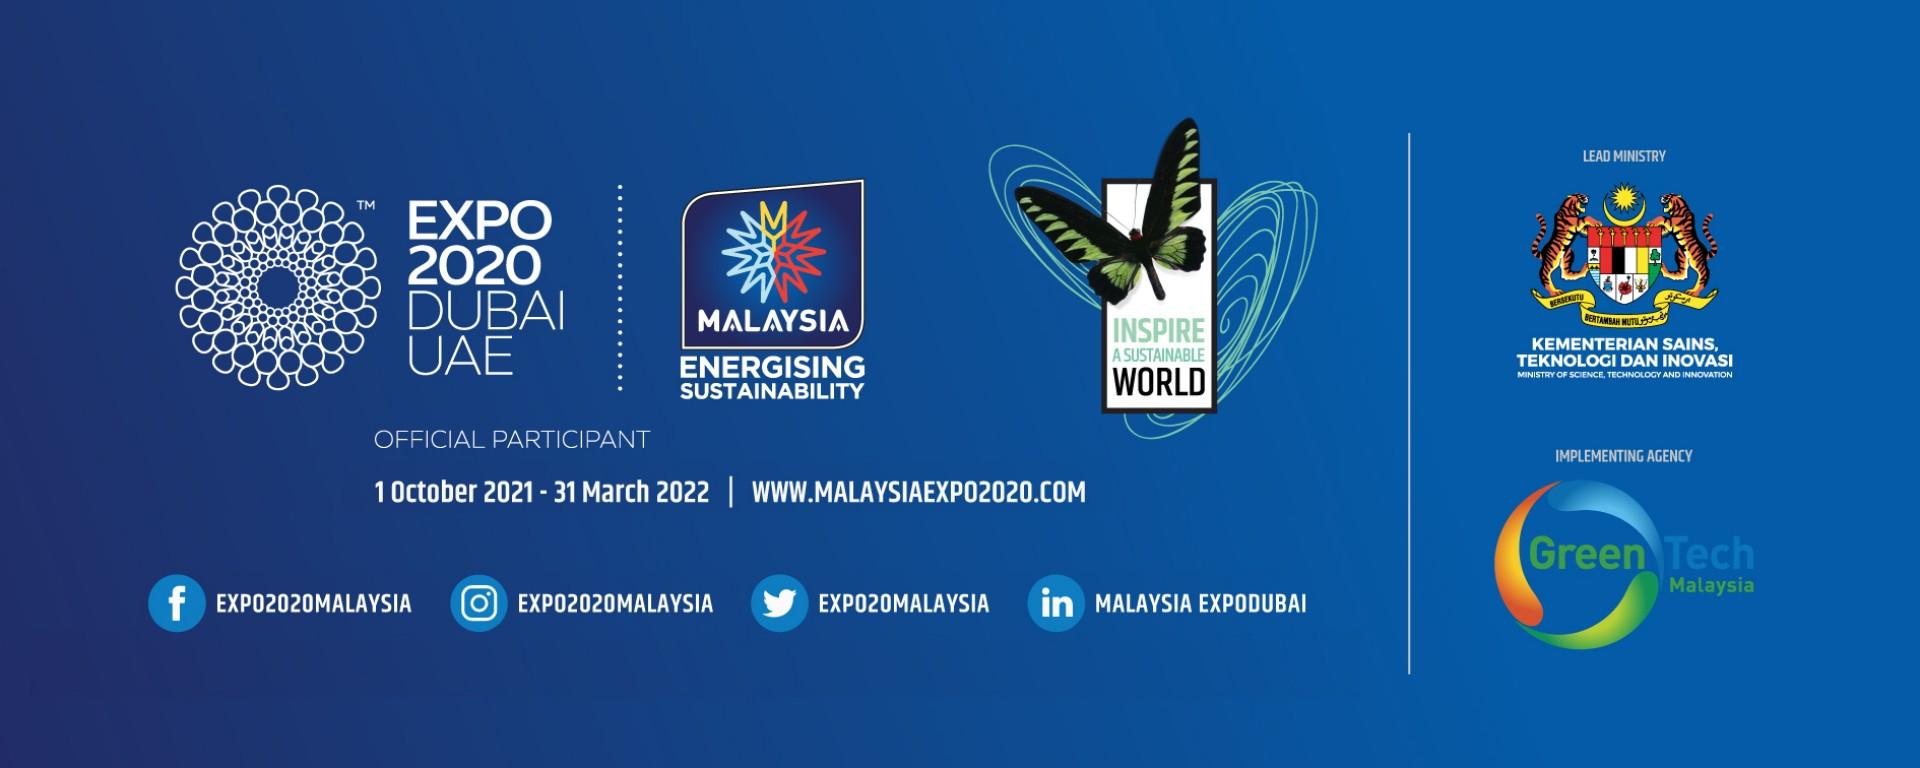 <div class='slider-left'><span class='caption'></span><div class='action '><a href='http://www.malaysiaexpo2020.com' class='btn btn-danger btn-lg' target=''>EXPO2020</a></div></div>